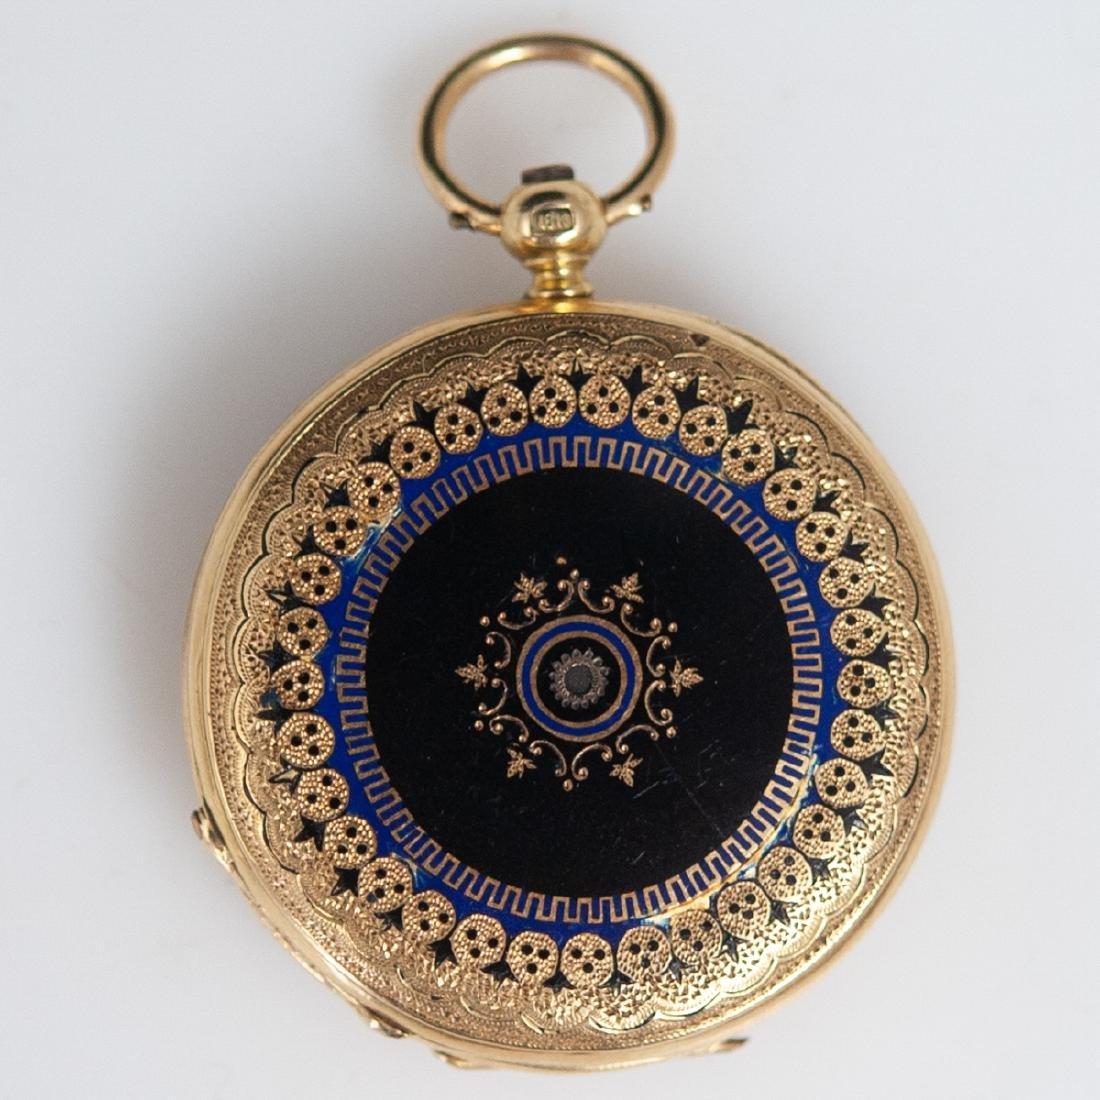 Vacheron 18kt Gold Enameled Pocket Watch - 3